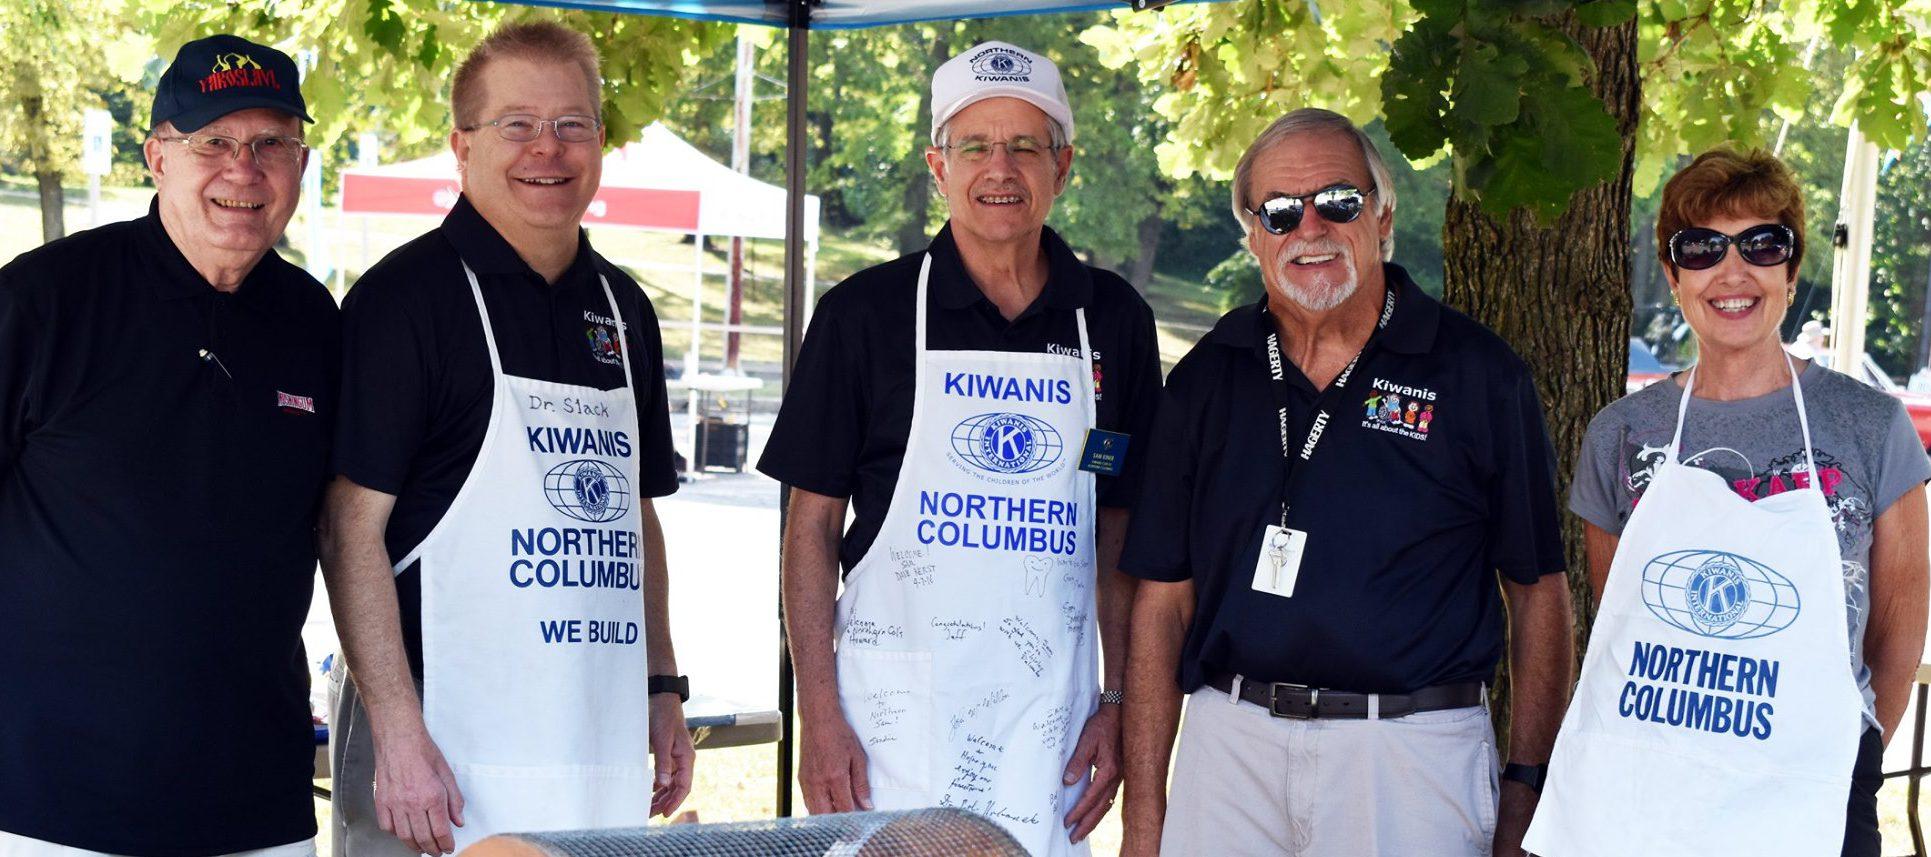 Kiwanis Club of Northern Columbus